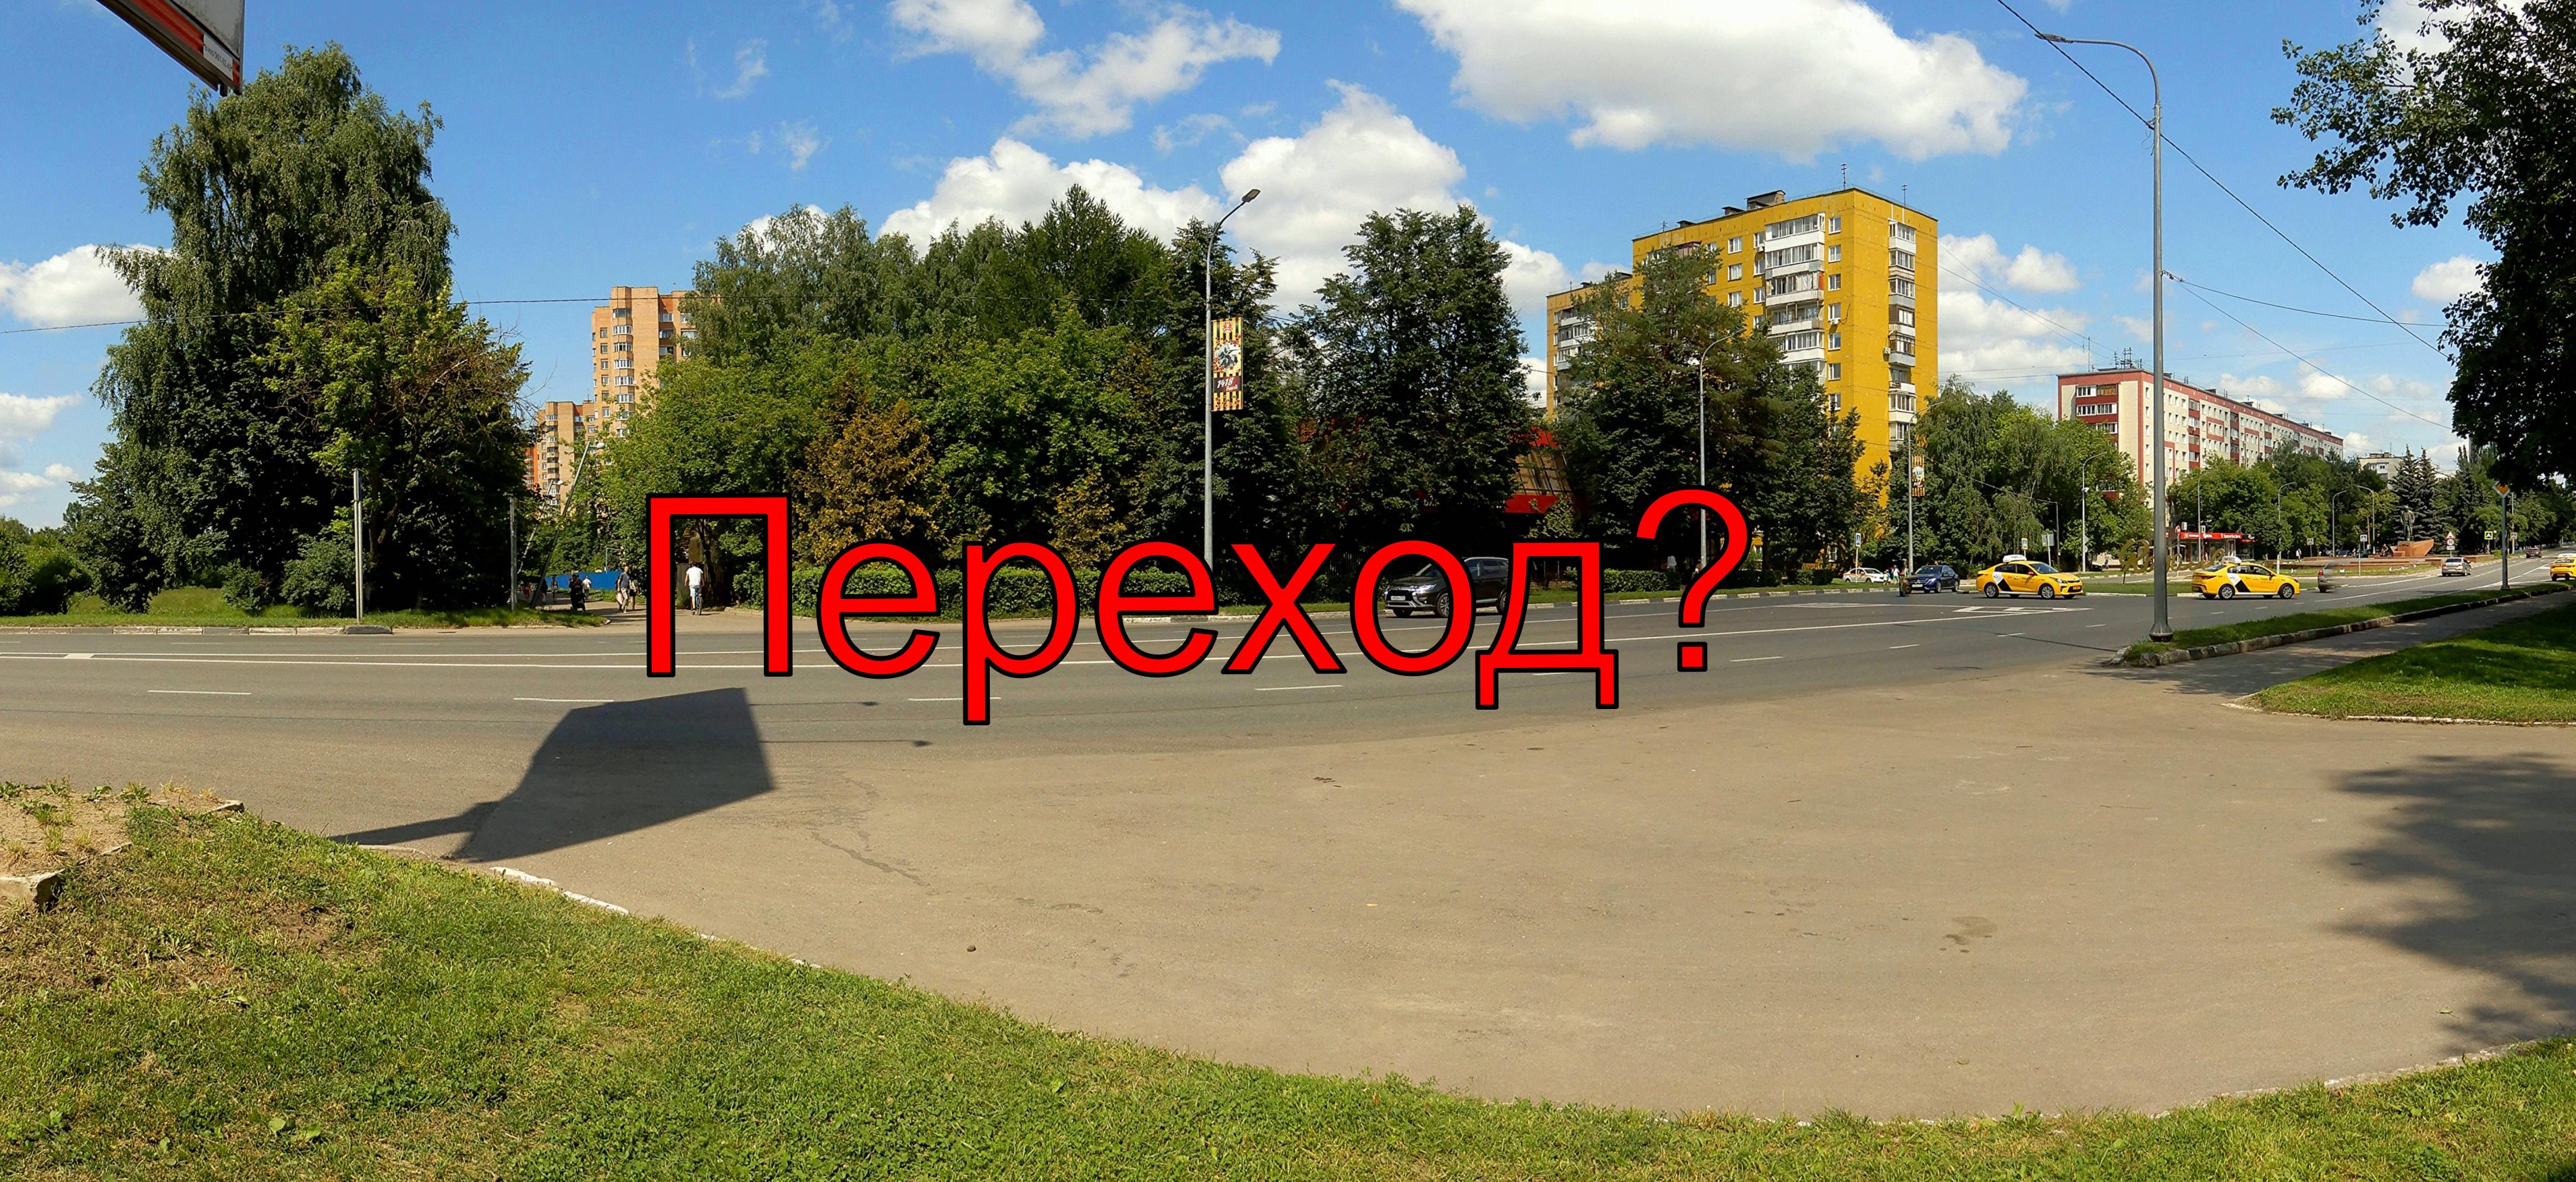 PEREXOD_1.jpg